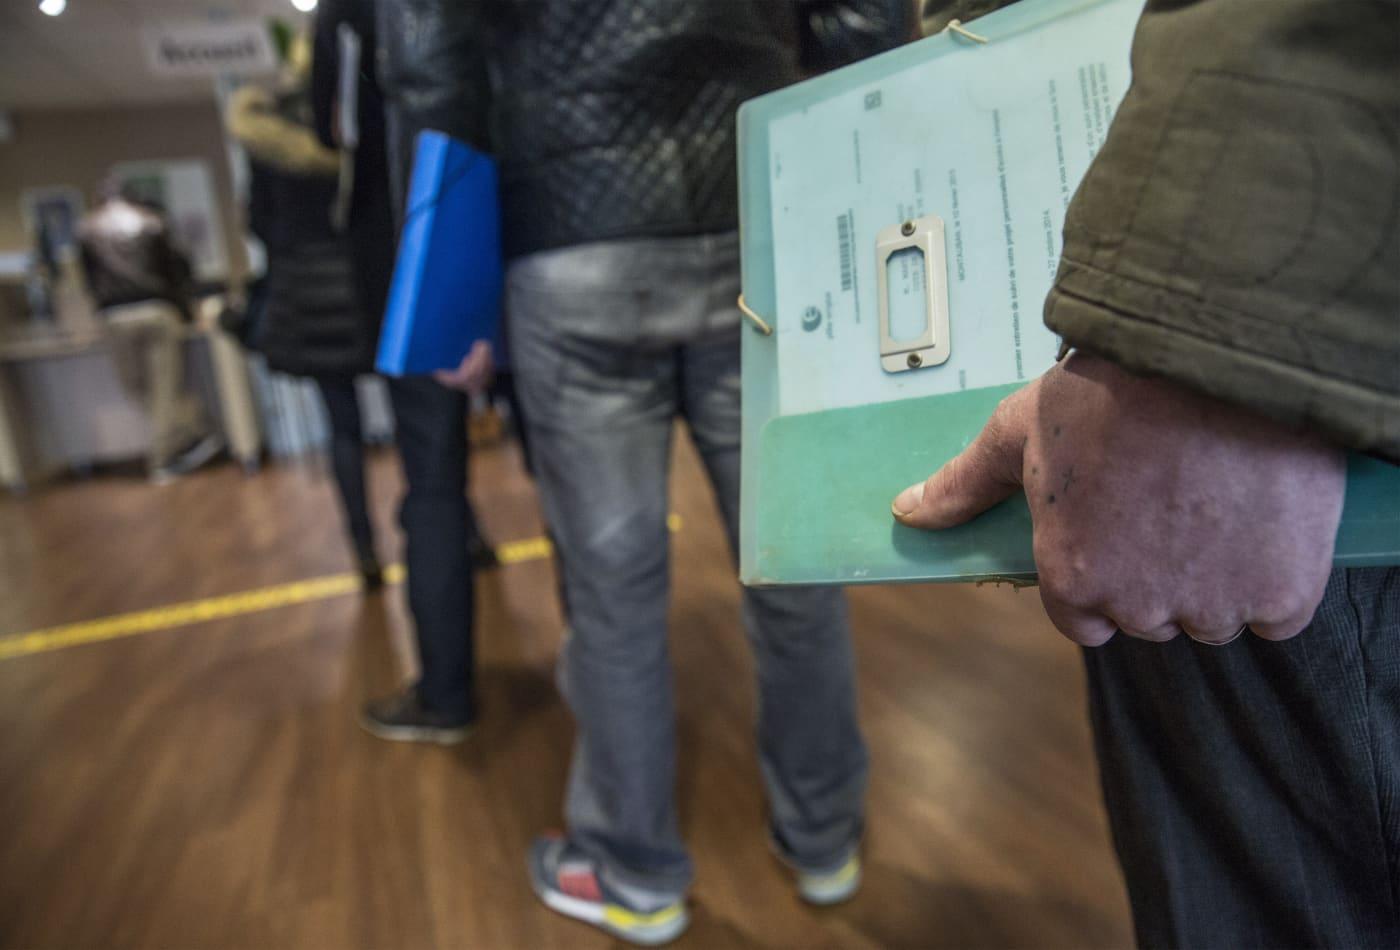 Coronavirus job losses could total 47 million, unemployment rate may hit 32%, Fed estimates